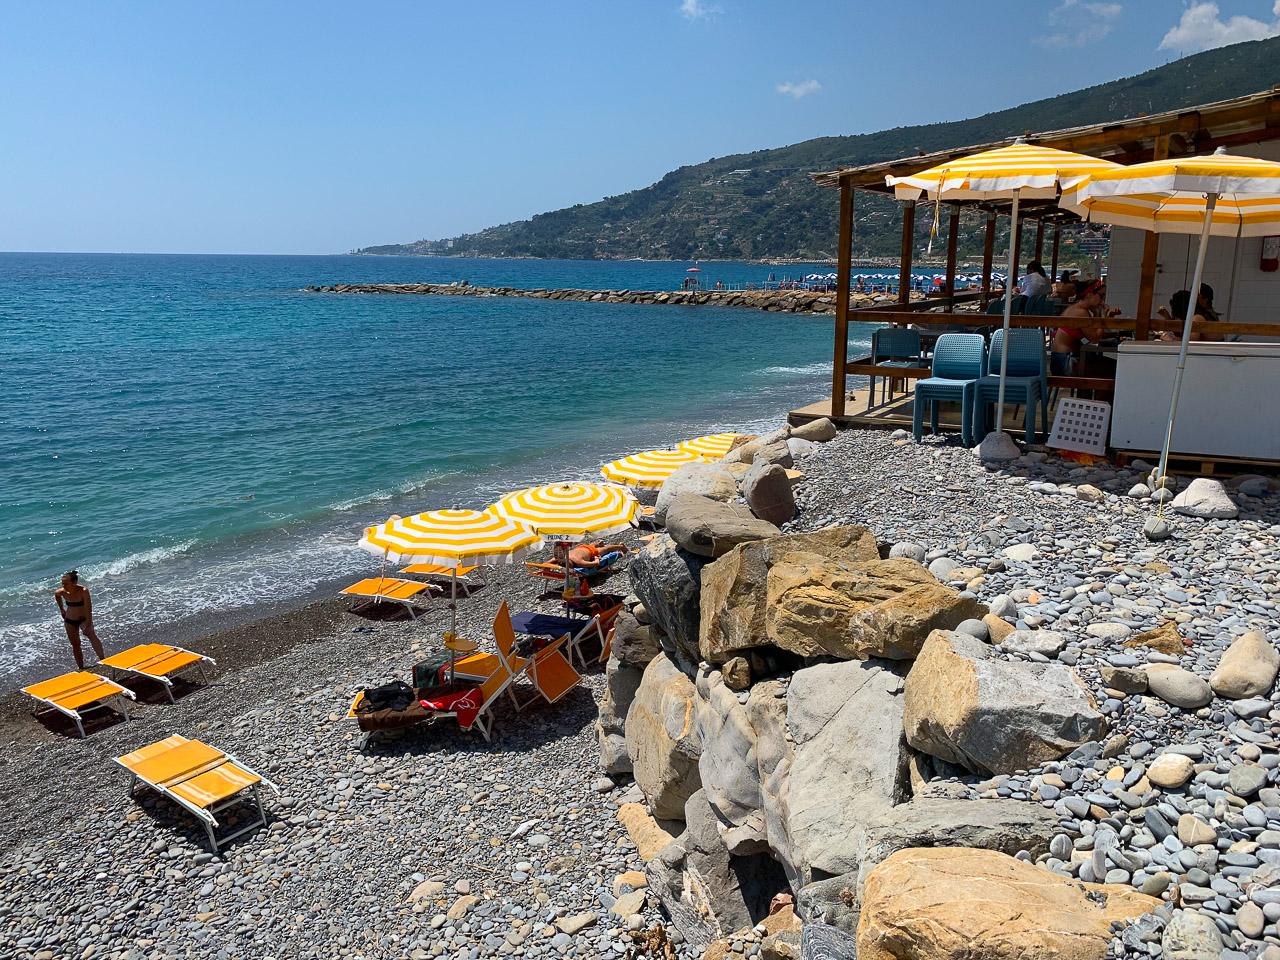 Beach bar in Ospedaletti